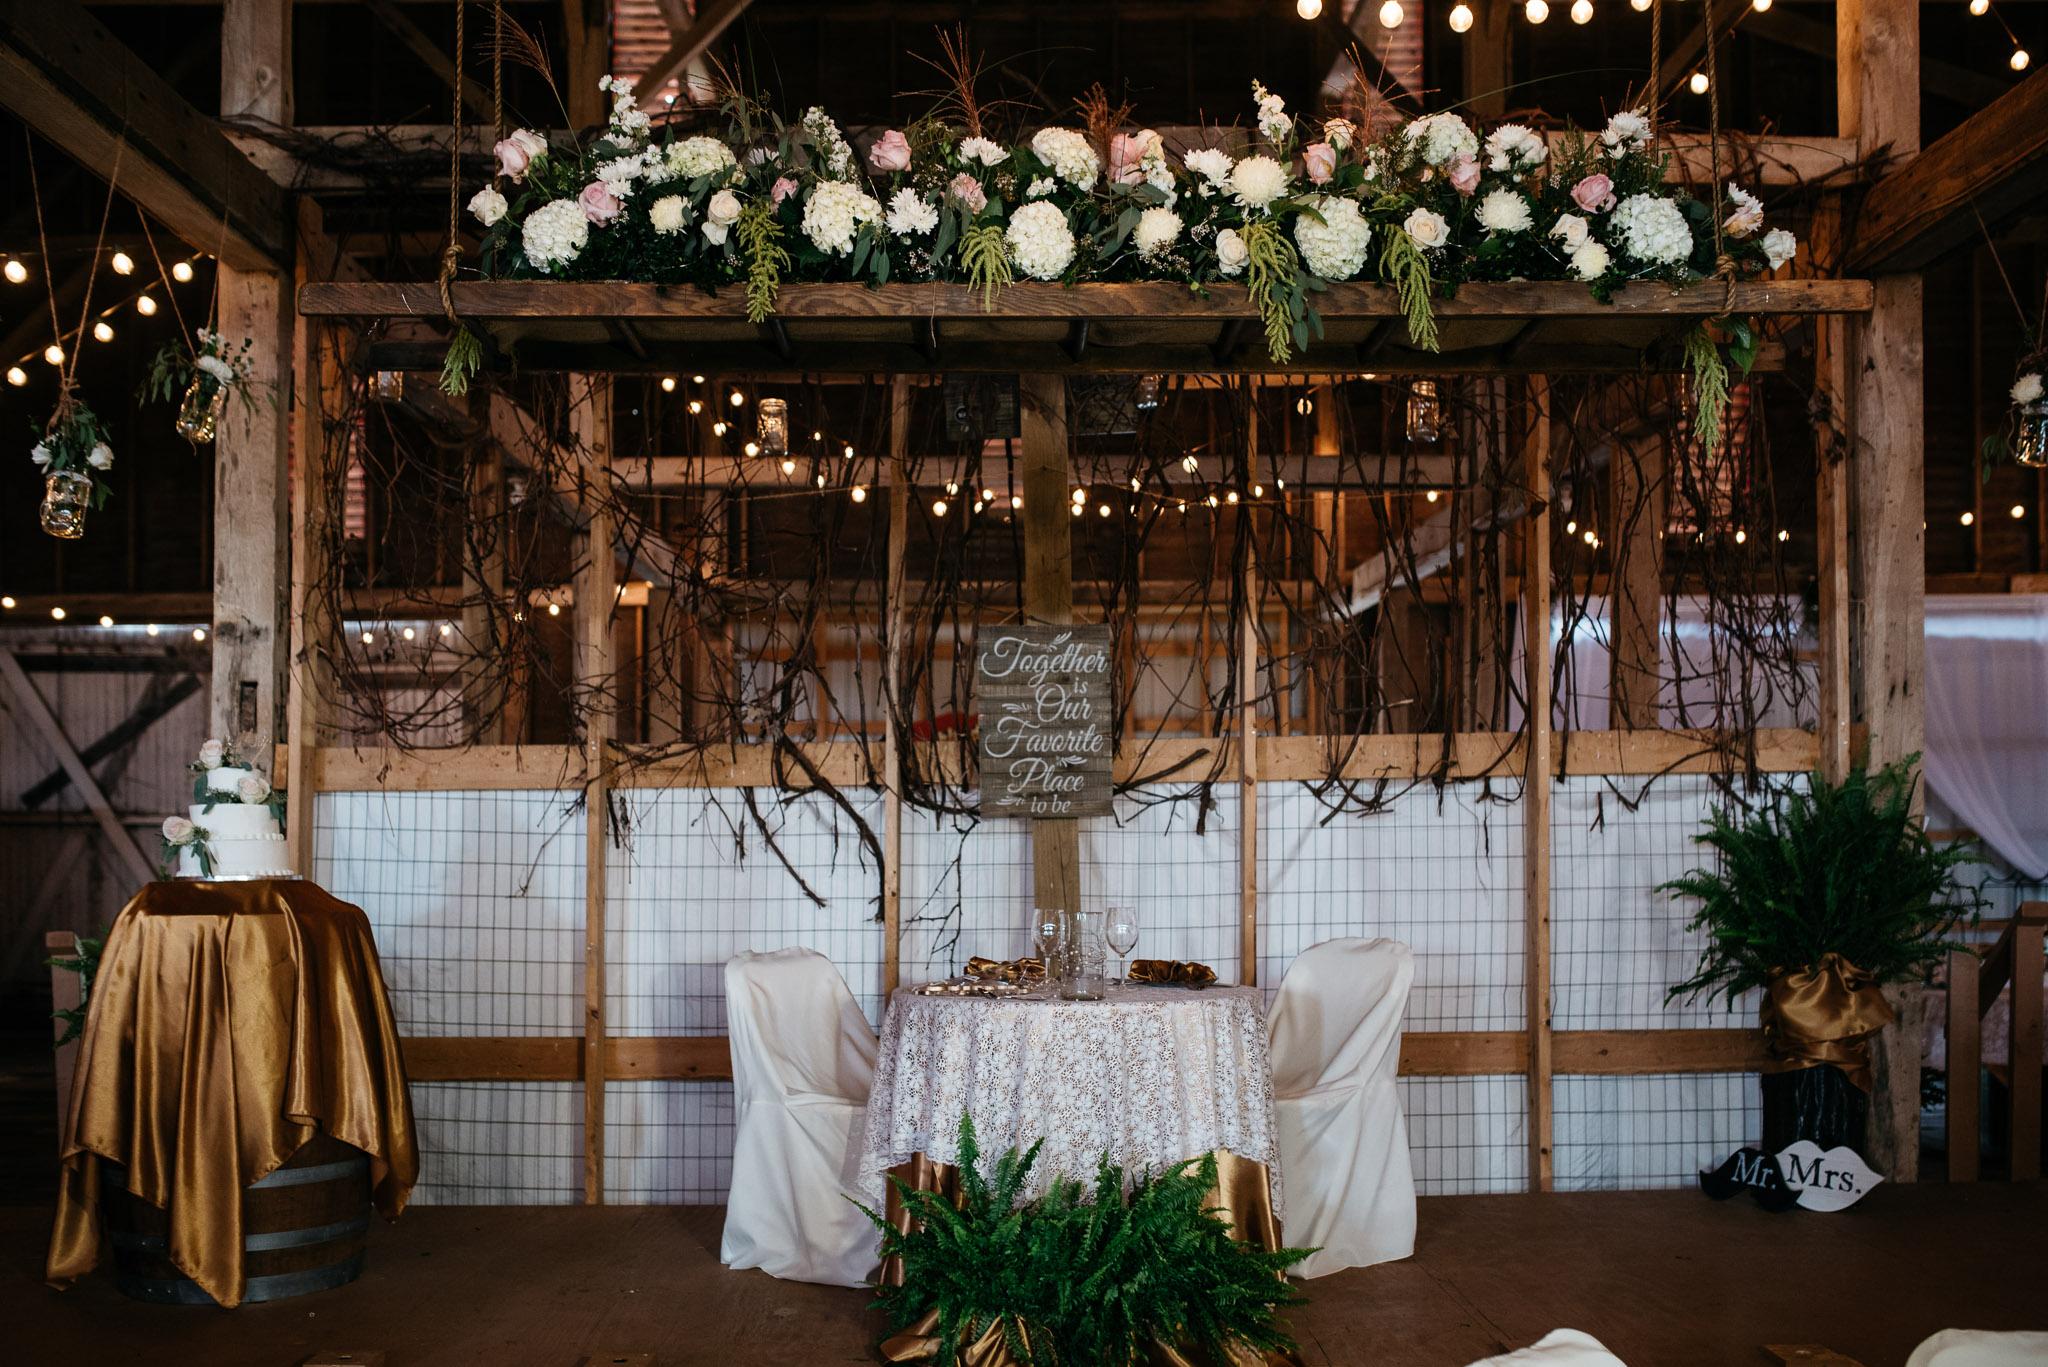 pittsburgh-ligonier-wedding-photographer-the-event-barn-at-highland-farms-29.jpg